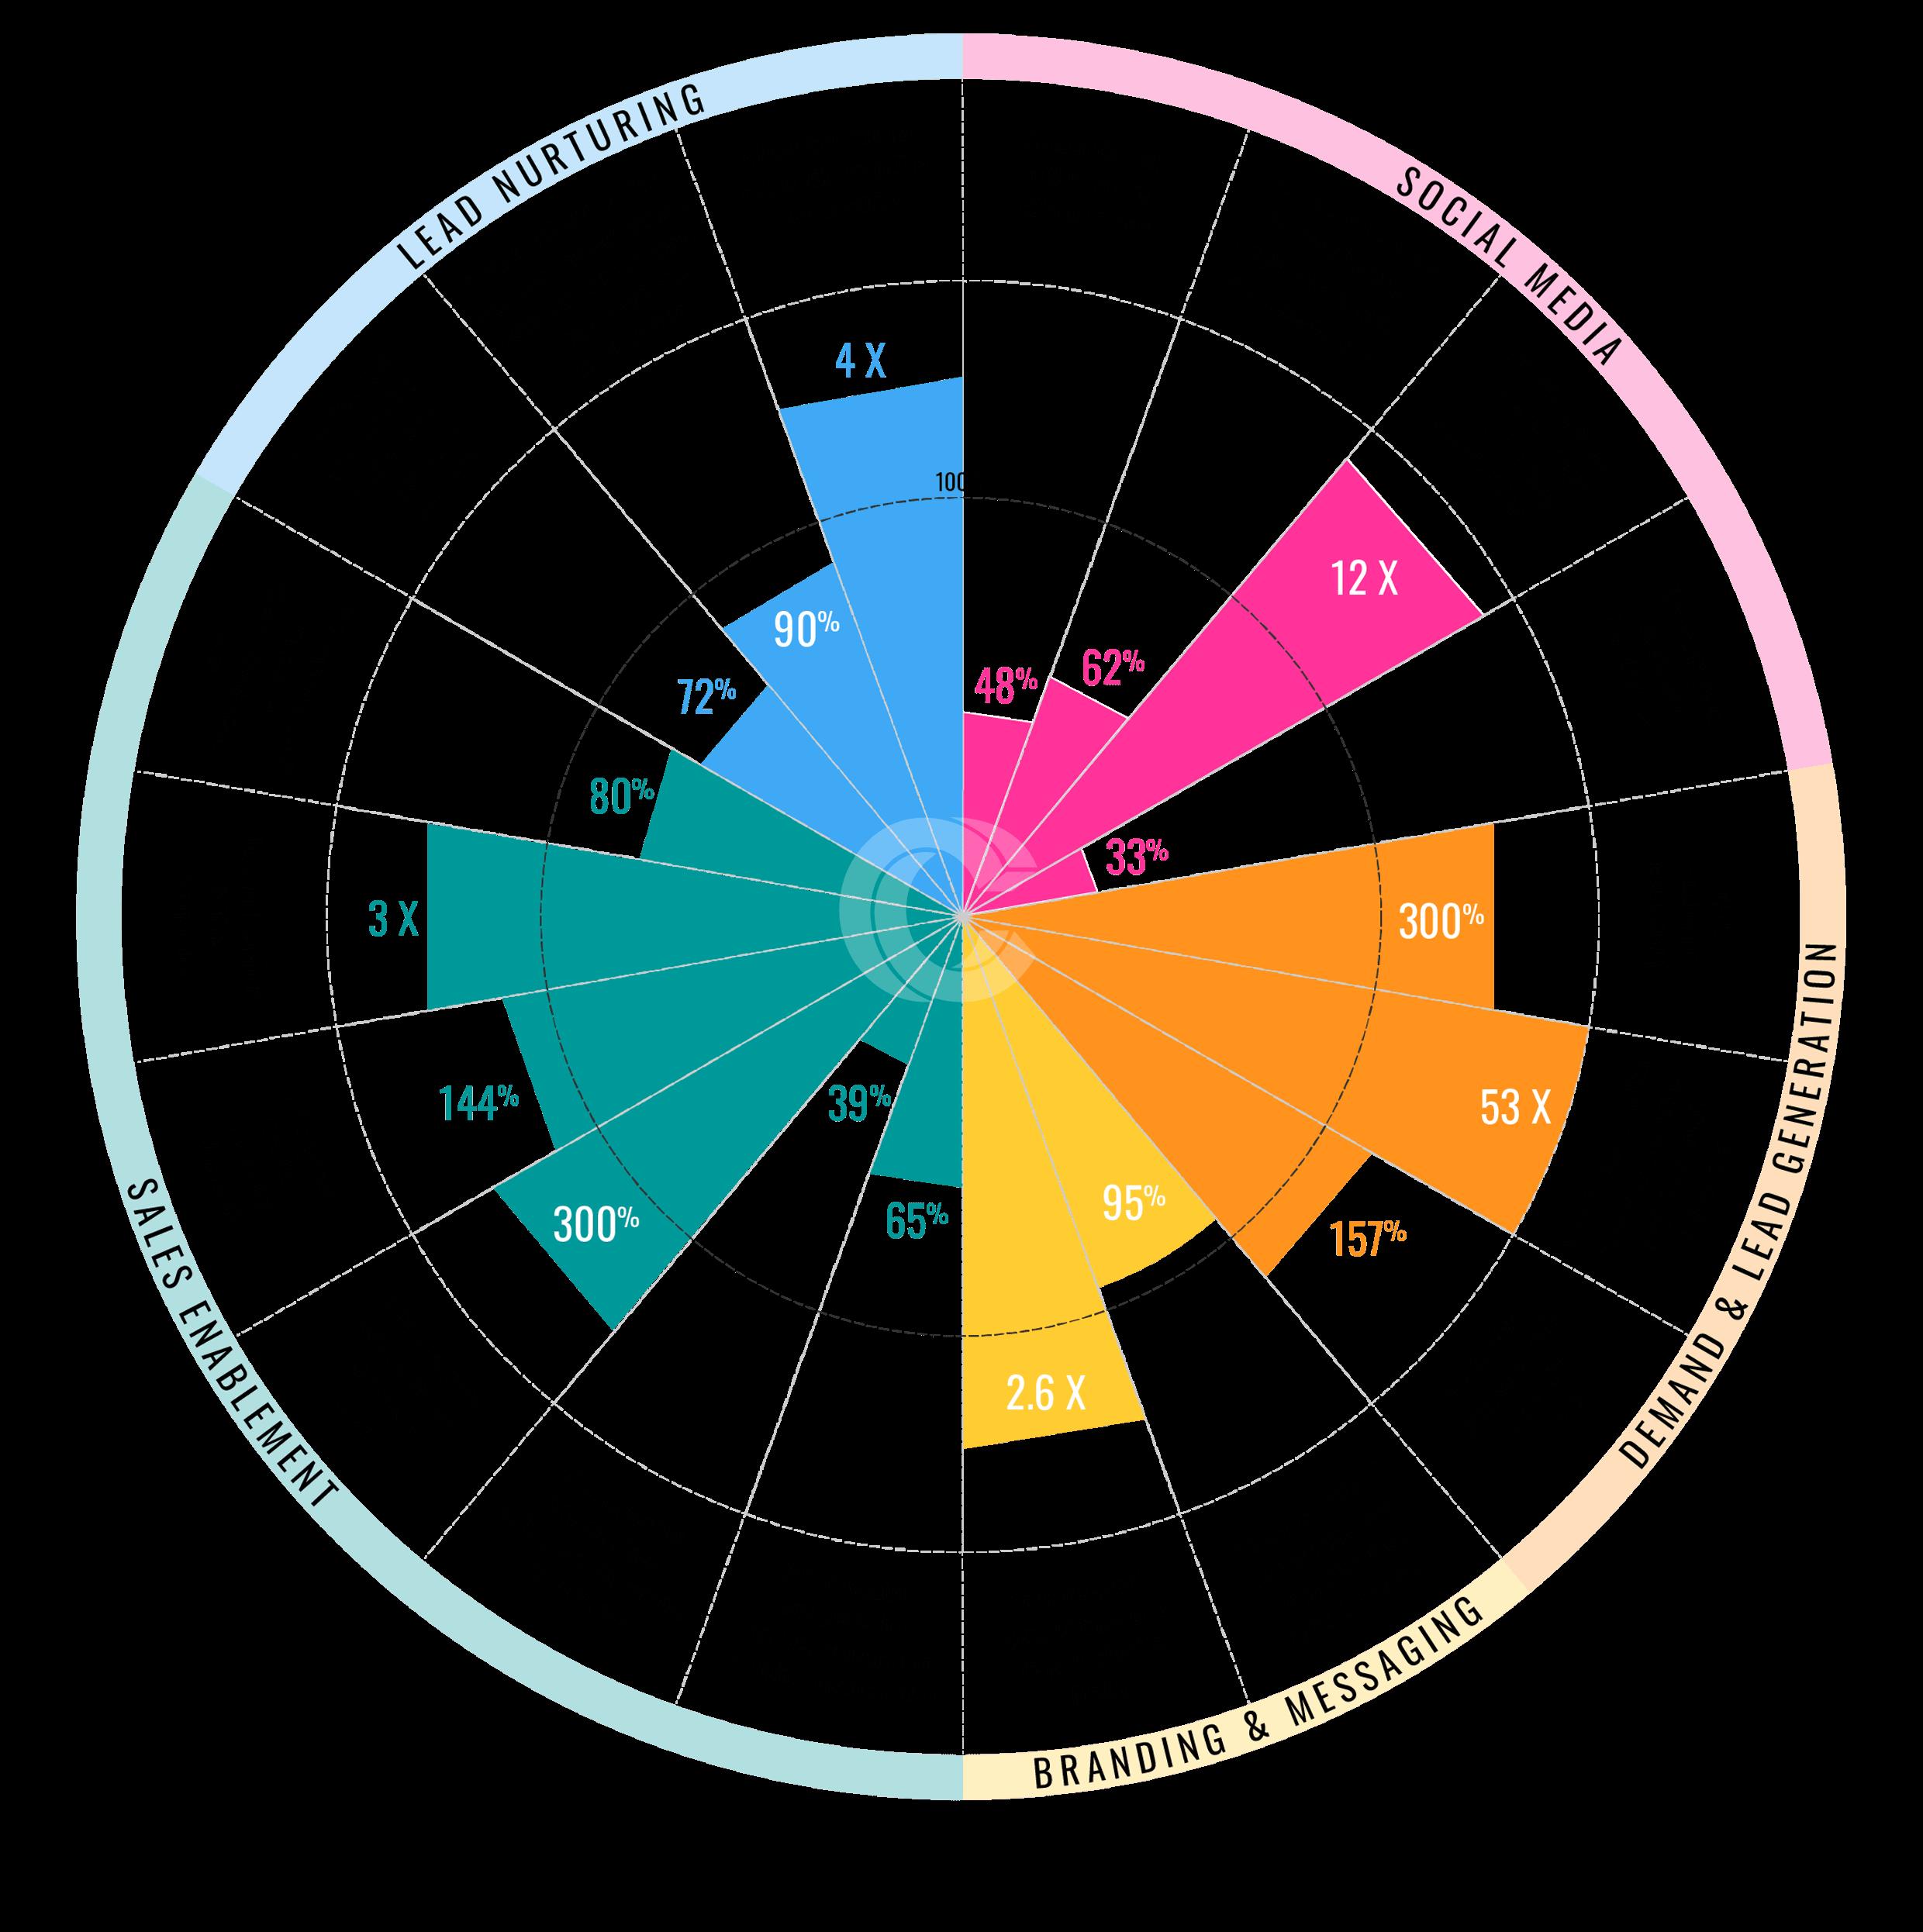 Video marketing infographic 2020